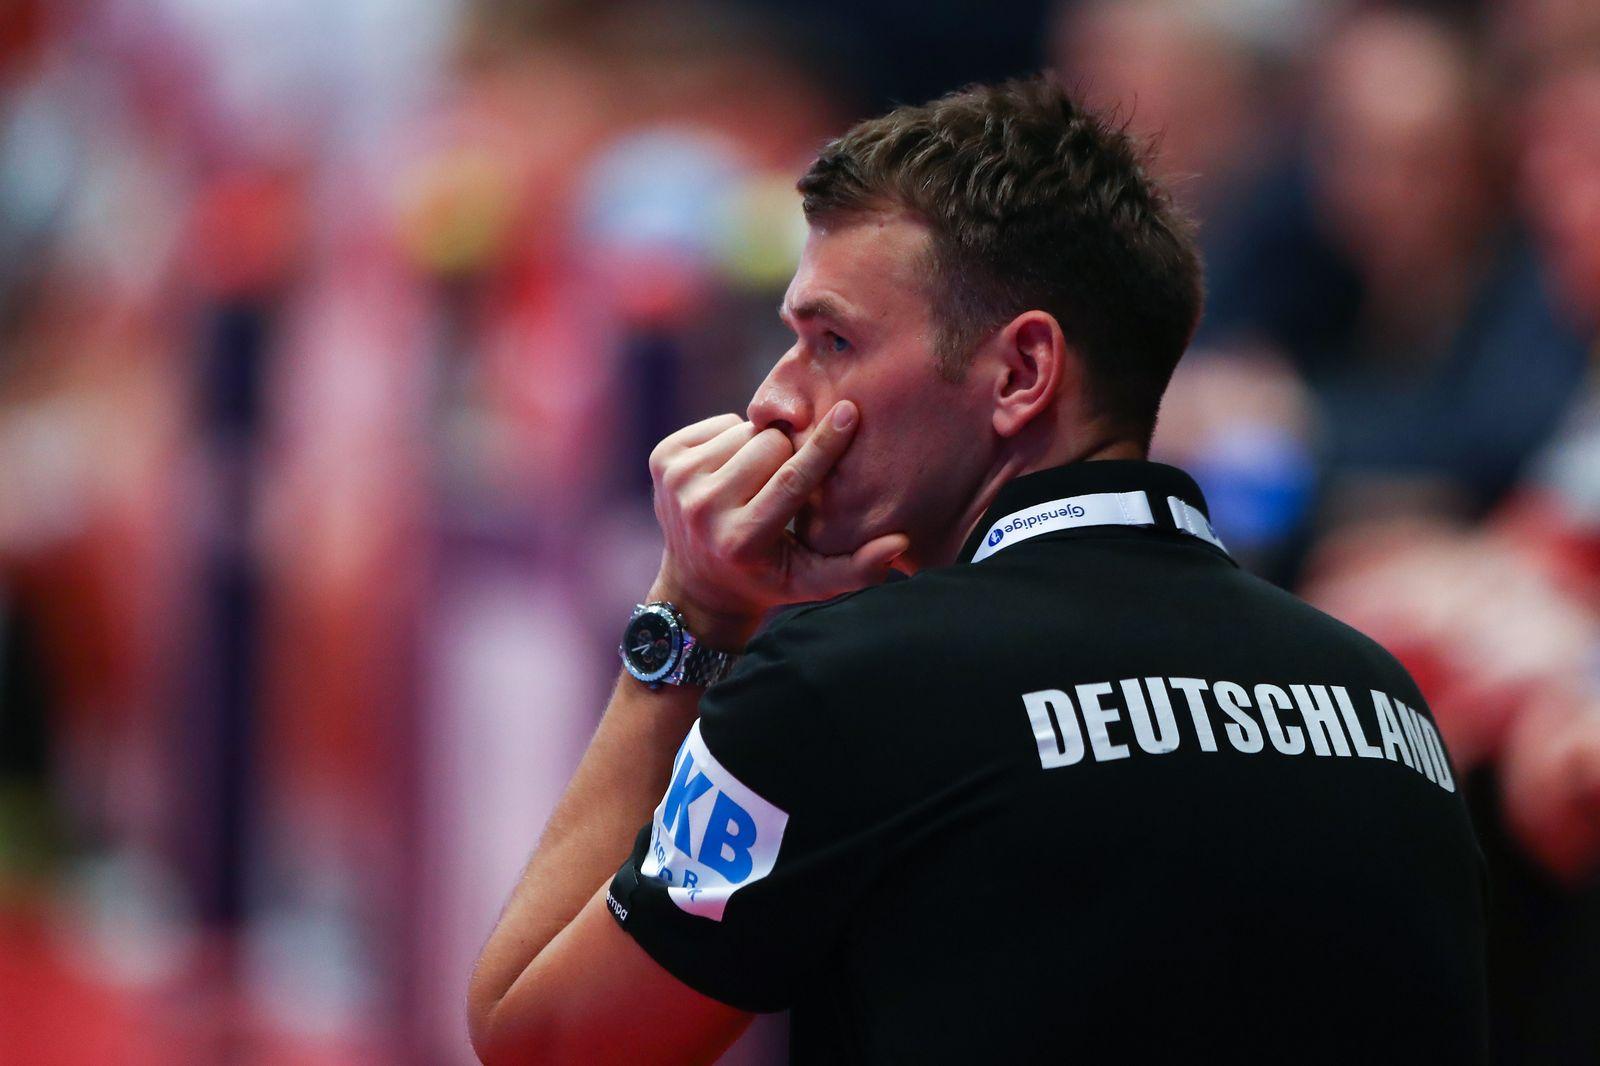 Austria v Germany: Group I - Men's EHF EURO 2020